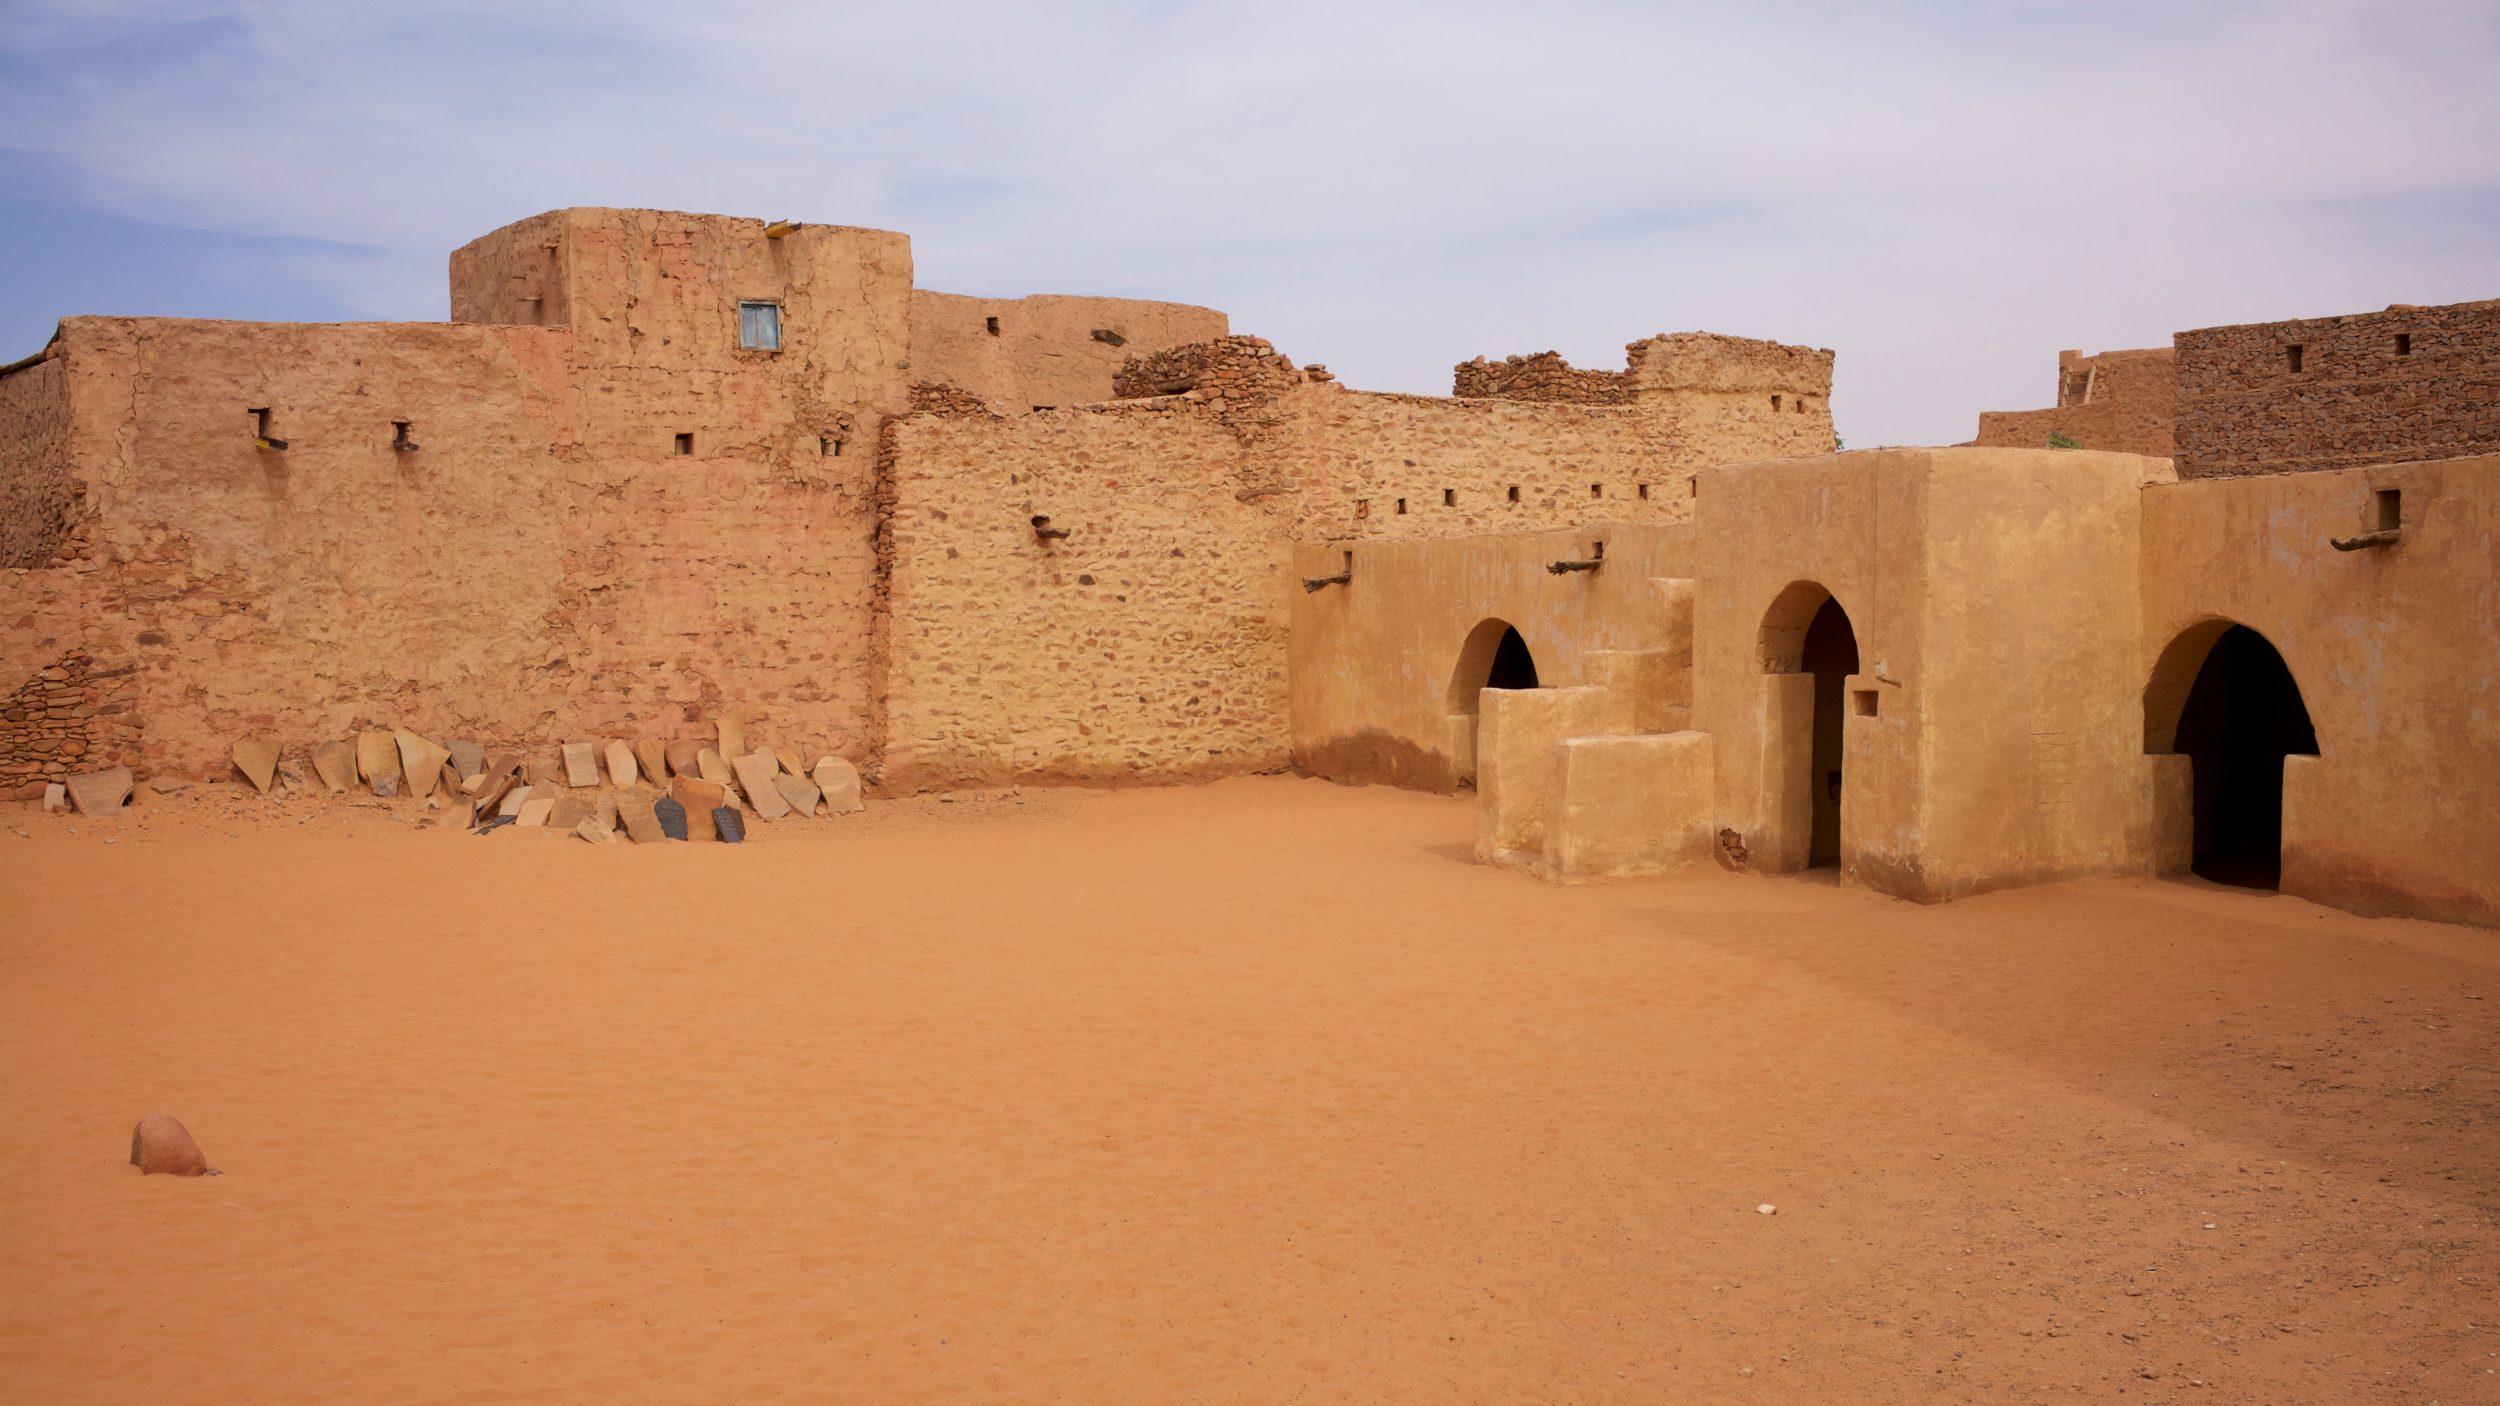 Mauritania [shutterstock]